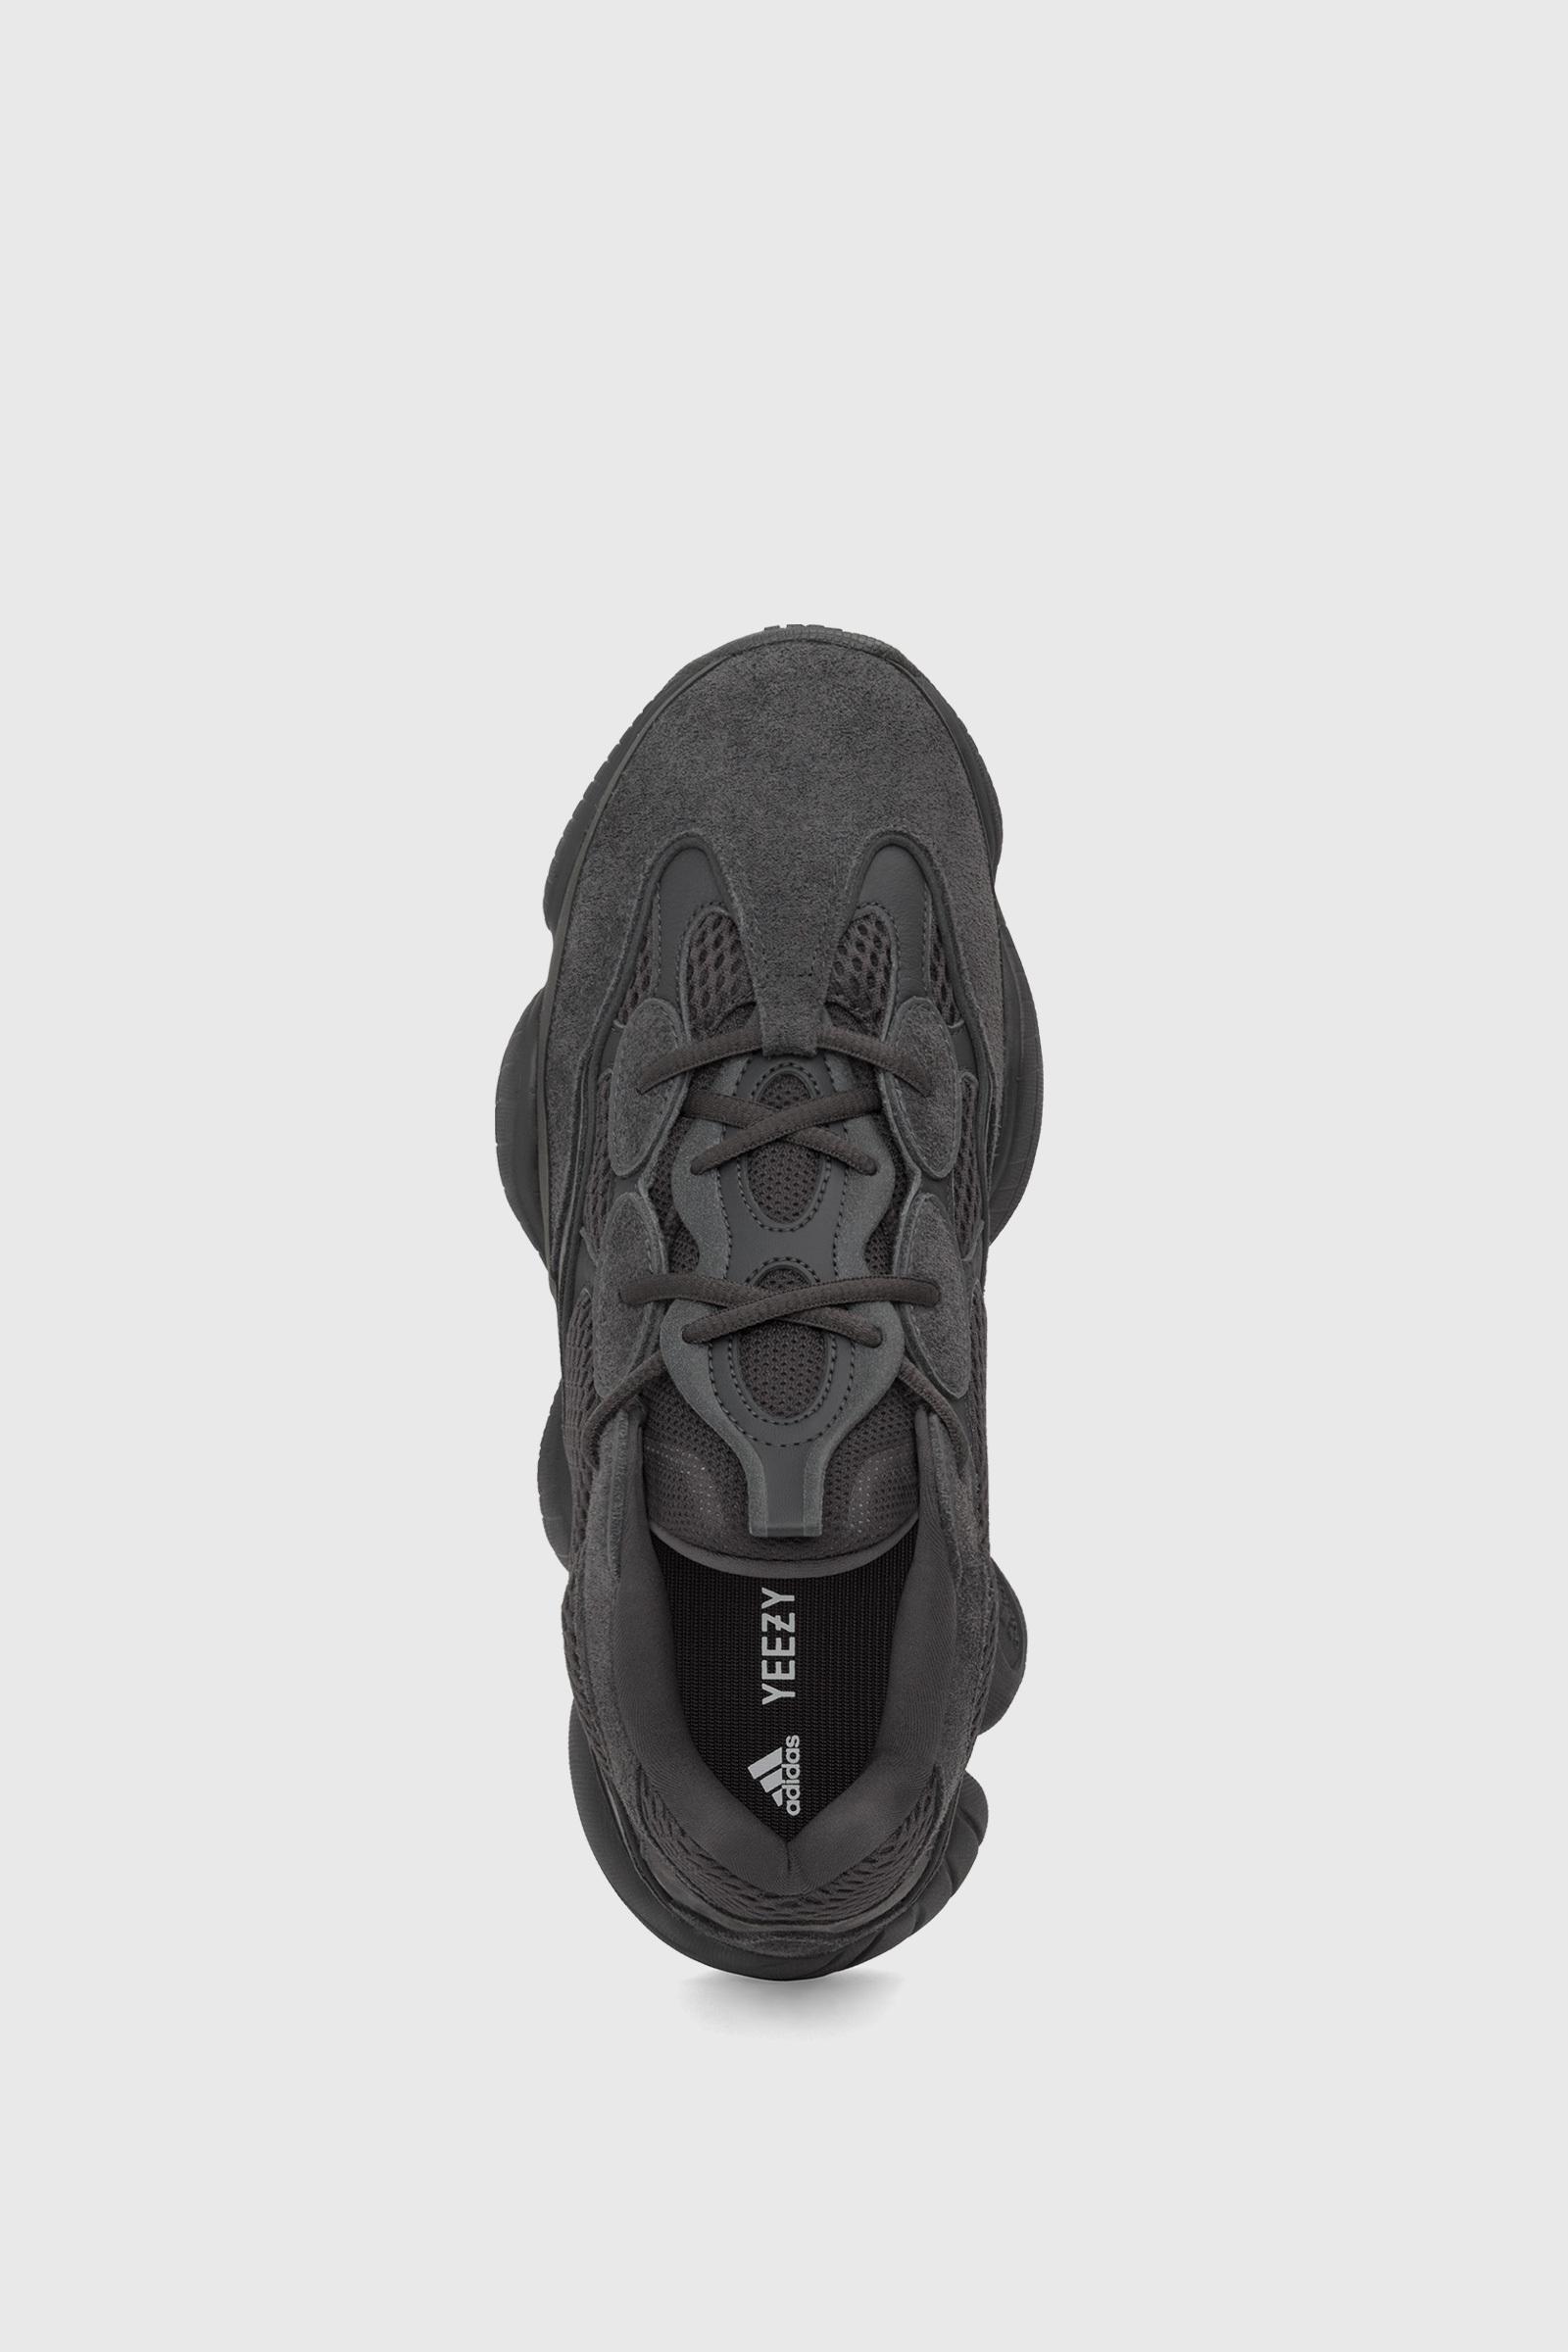 yeezy shoes black